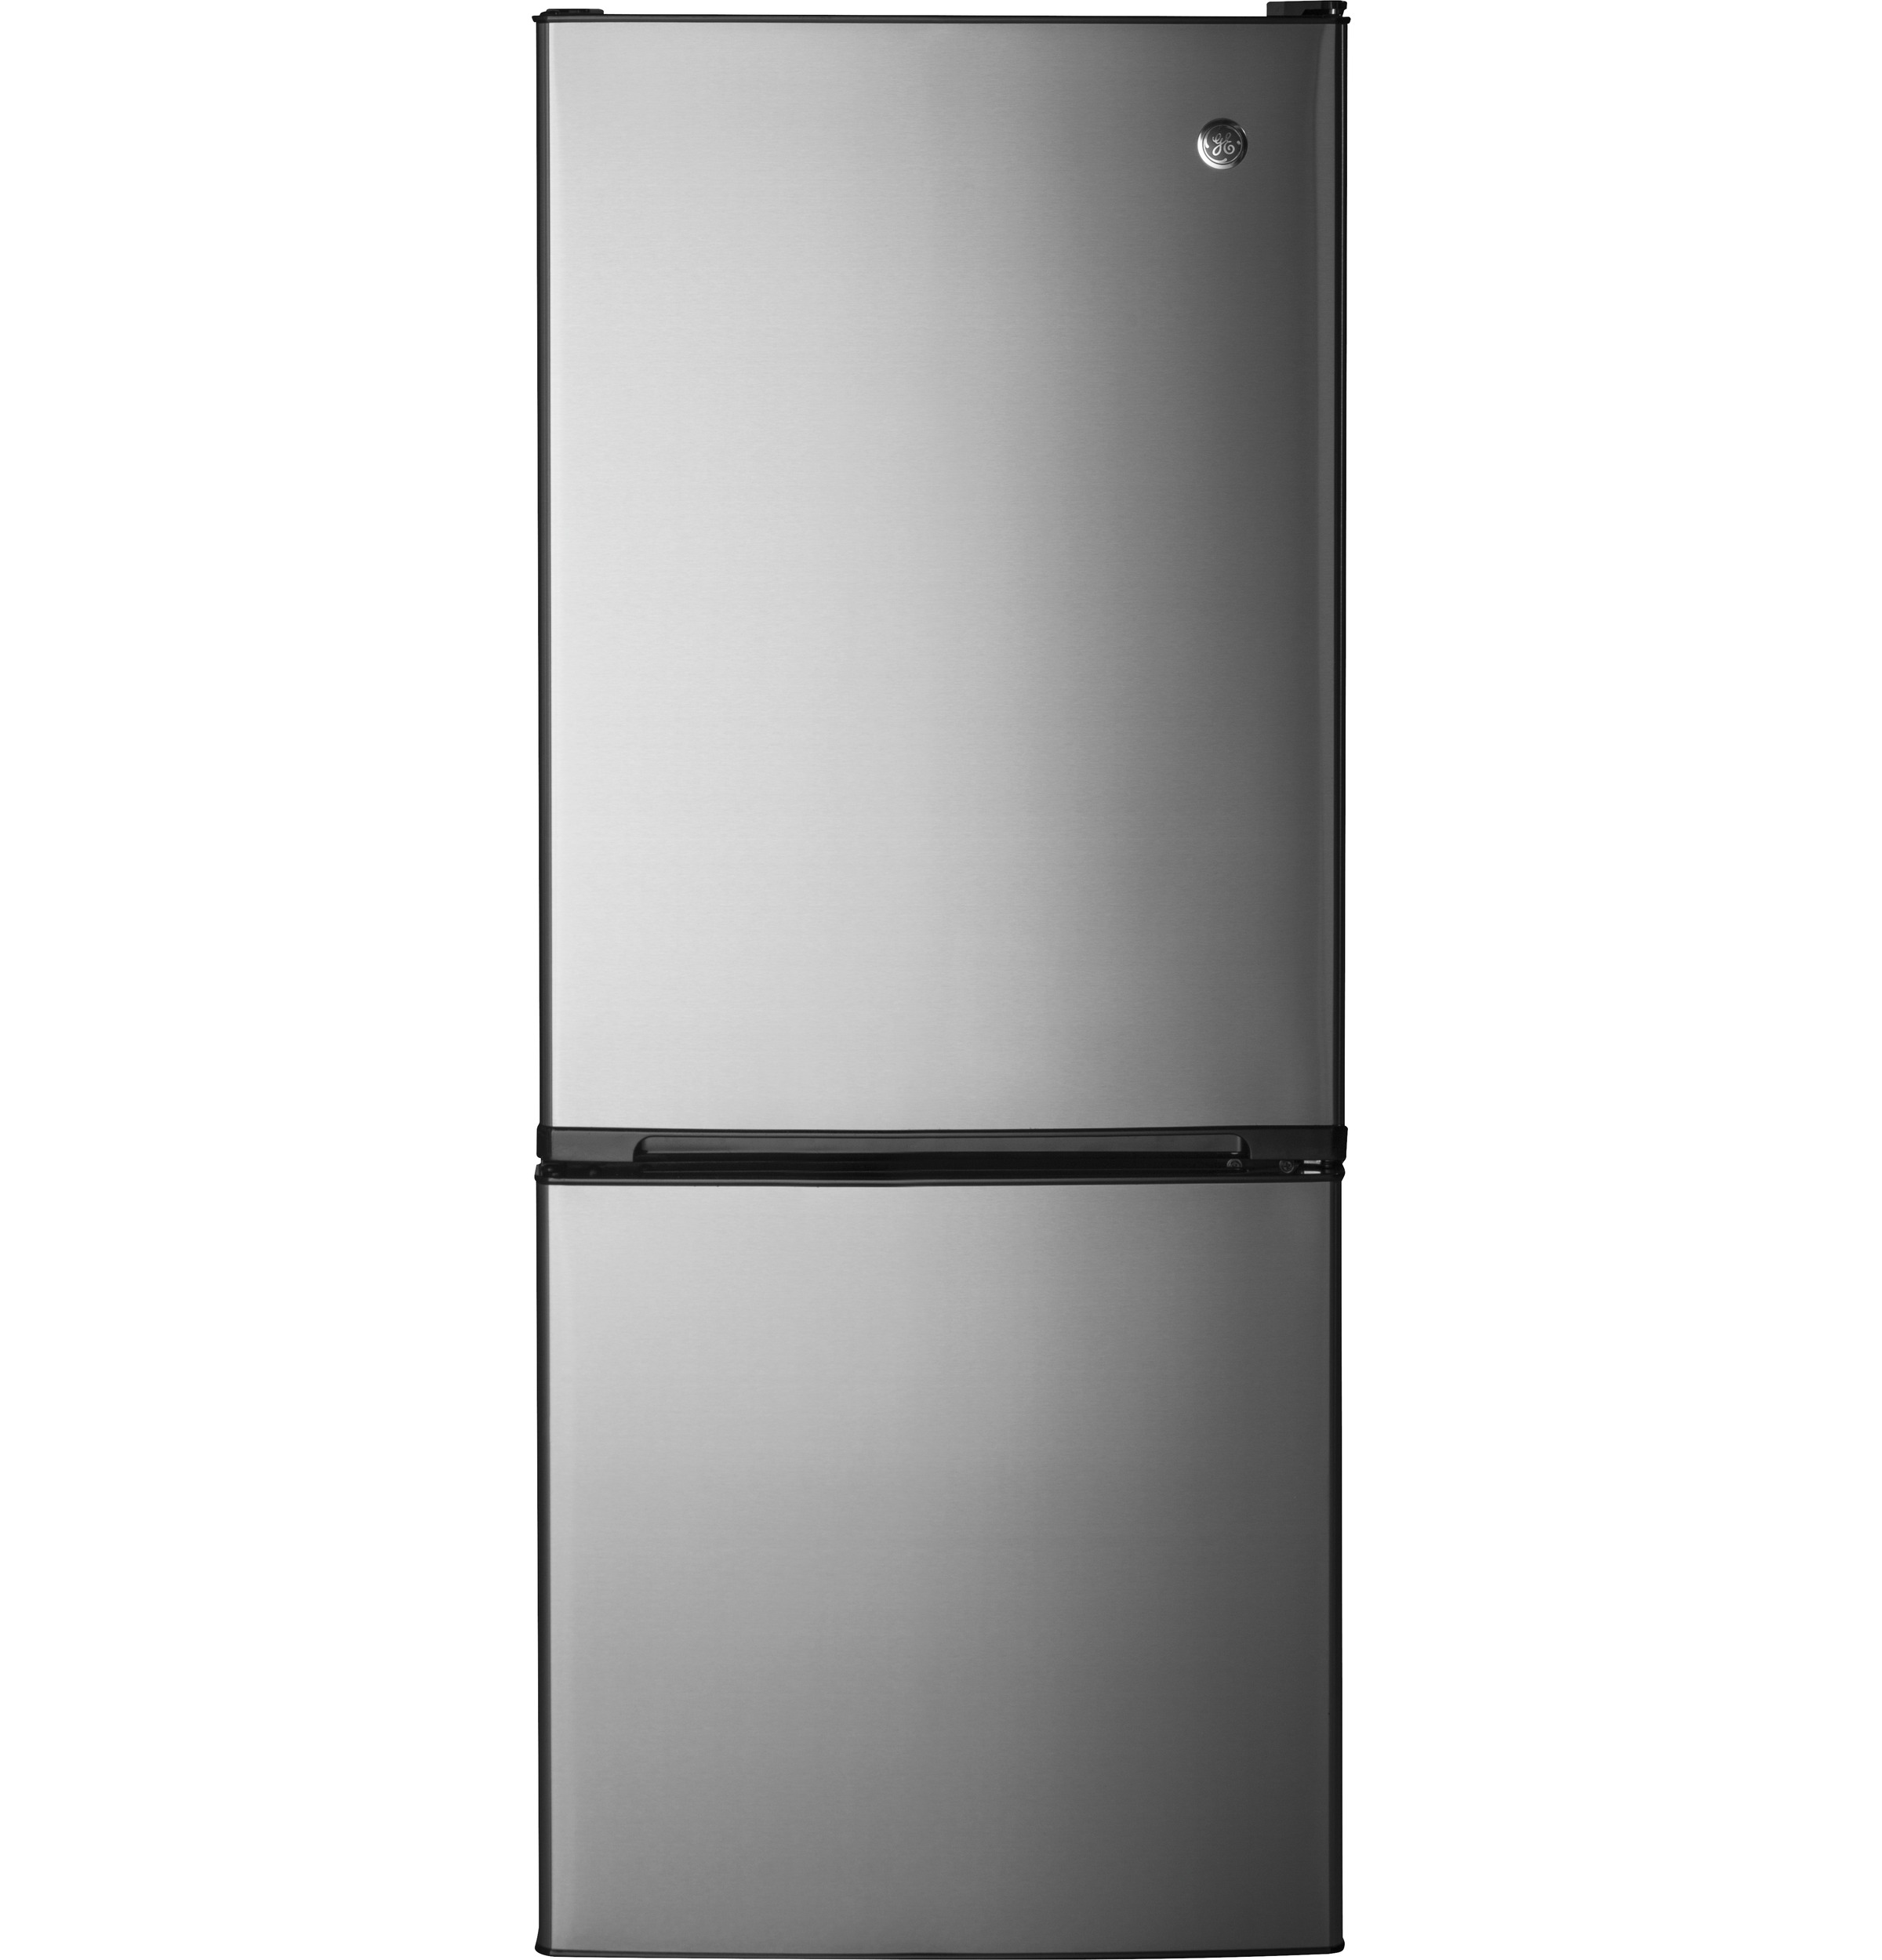 GE Appliances Bottom-Freezer Refrigerators 10.5 Cu. Ft. Bottom-Freezer Refrigerator - Item Number: GBE10ESJSB